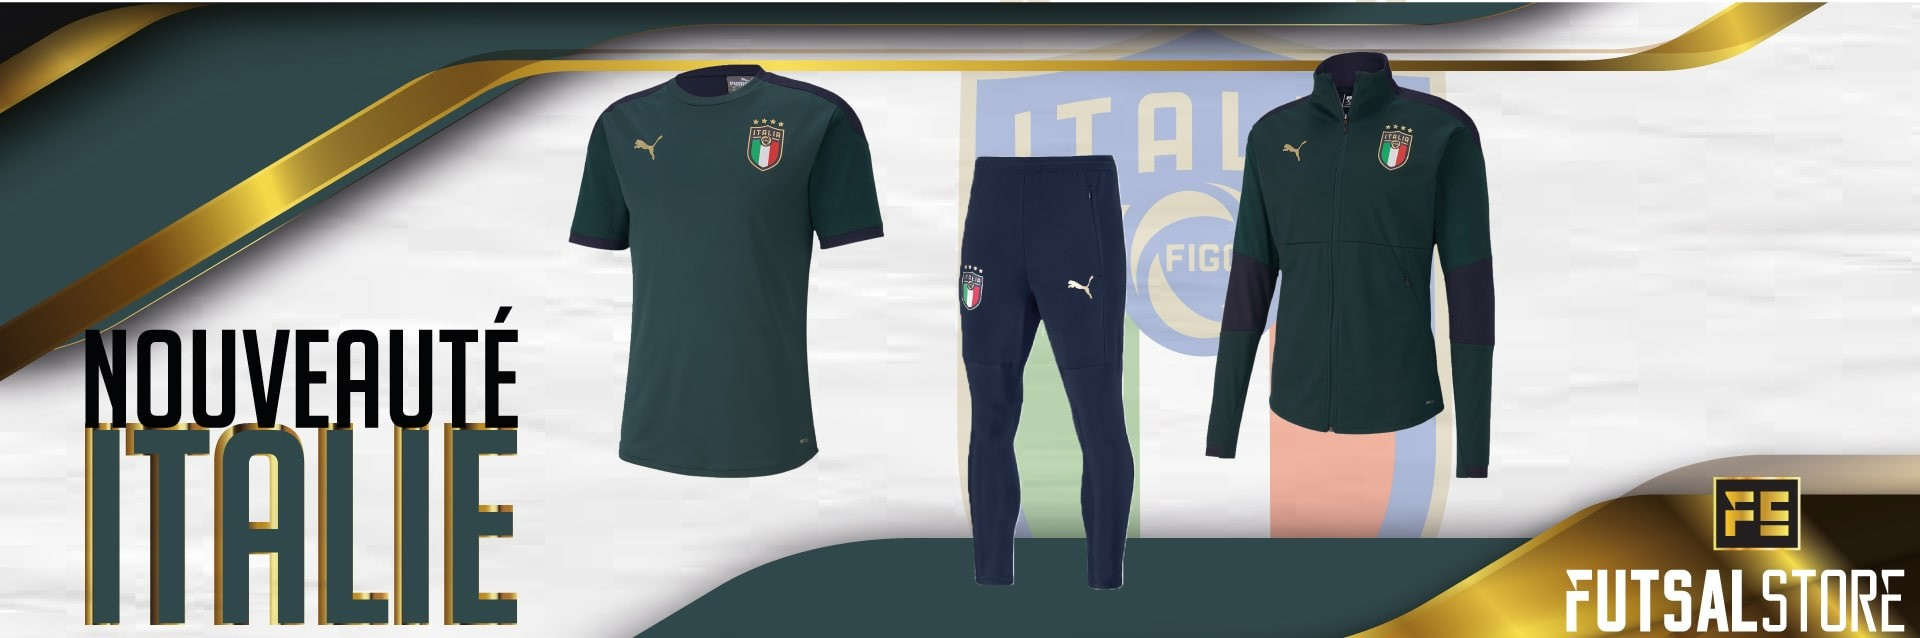 Produits Football Italie Euro 2020